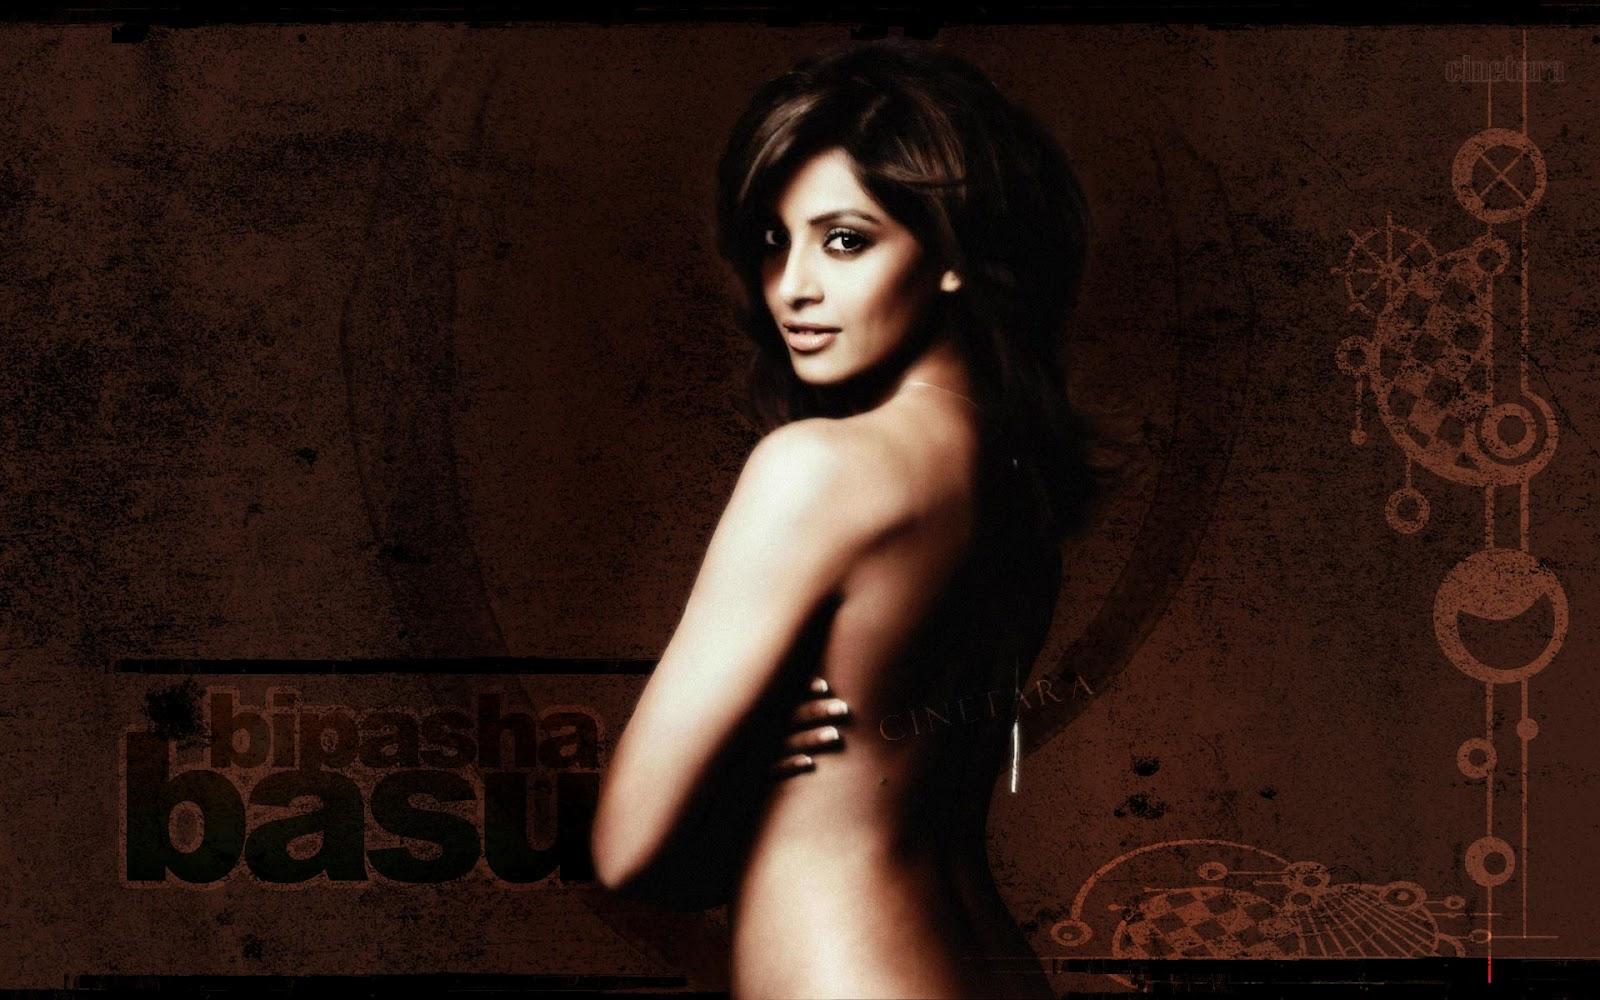 Bipasha basu hot photoshoot wallpapers in jpg format for free download